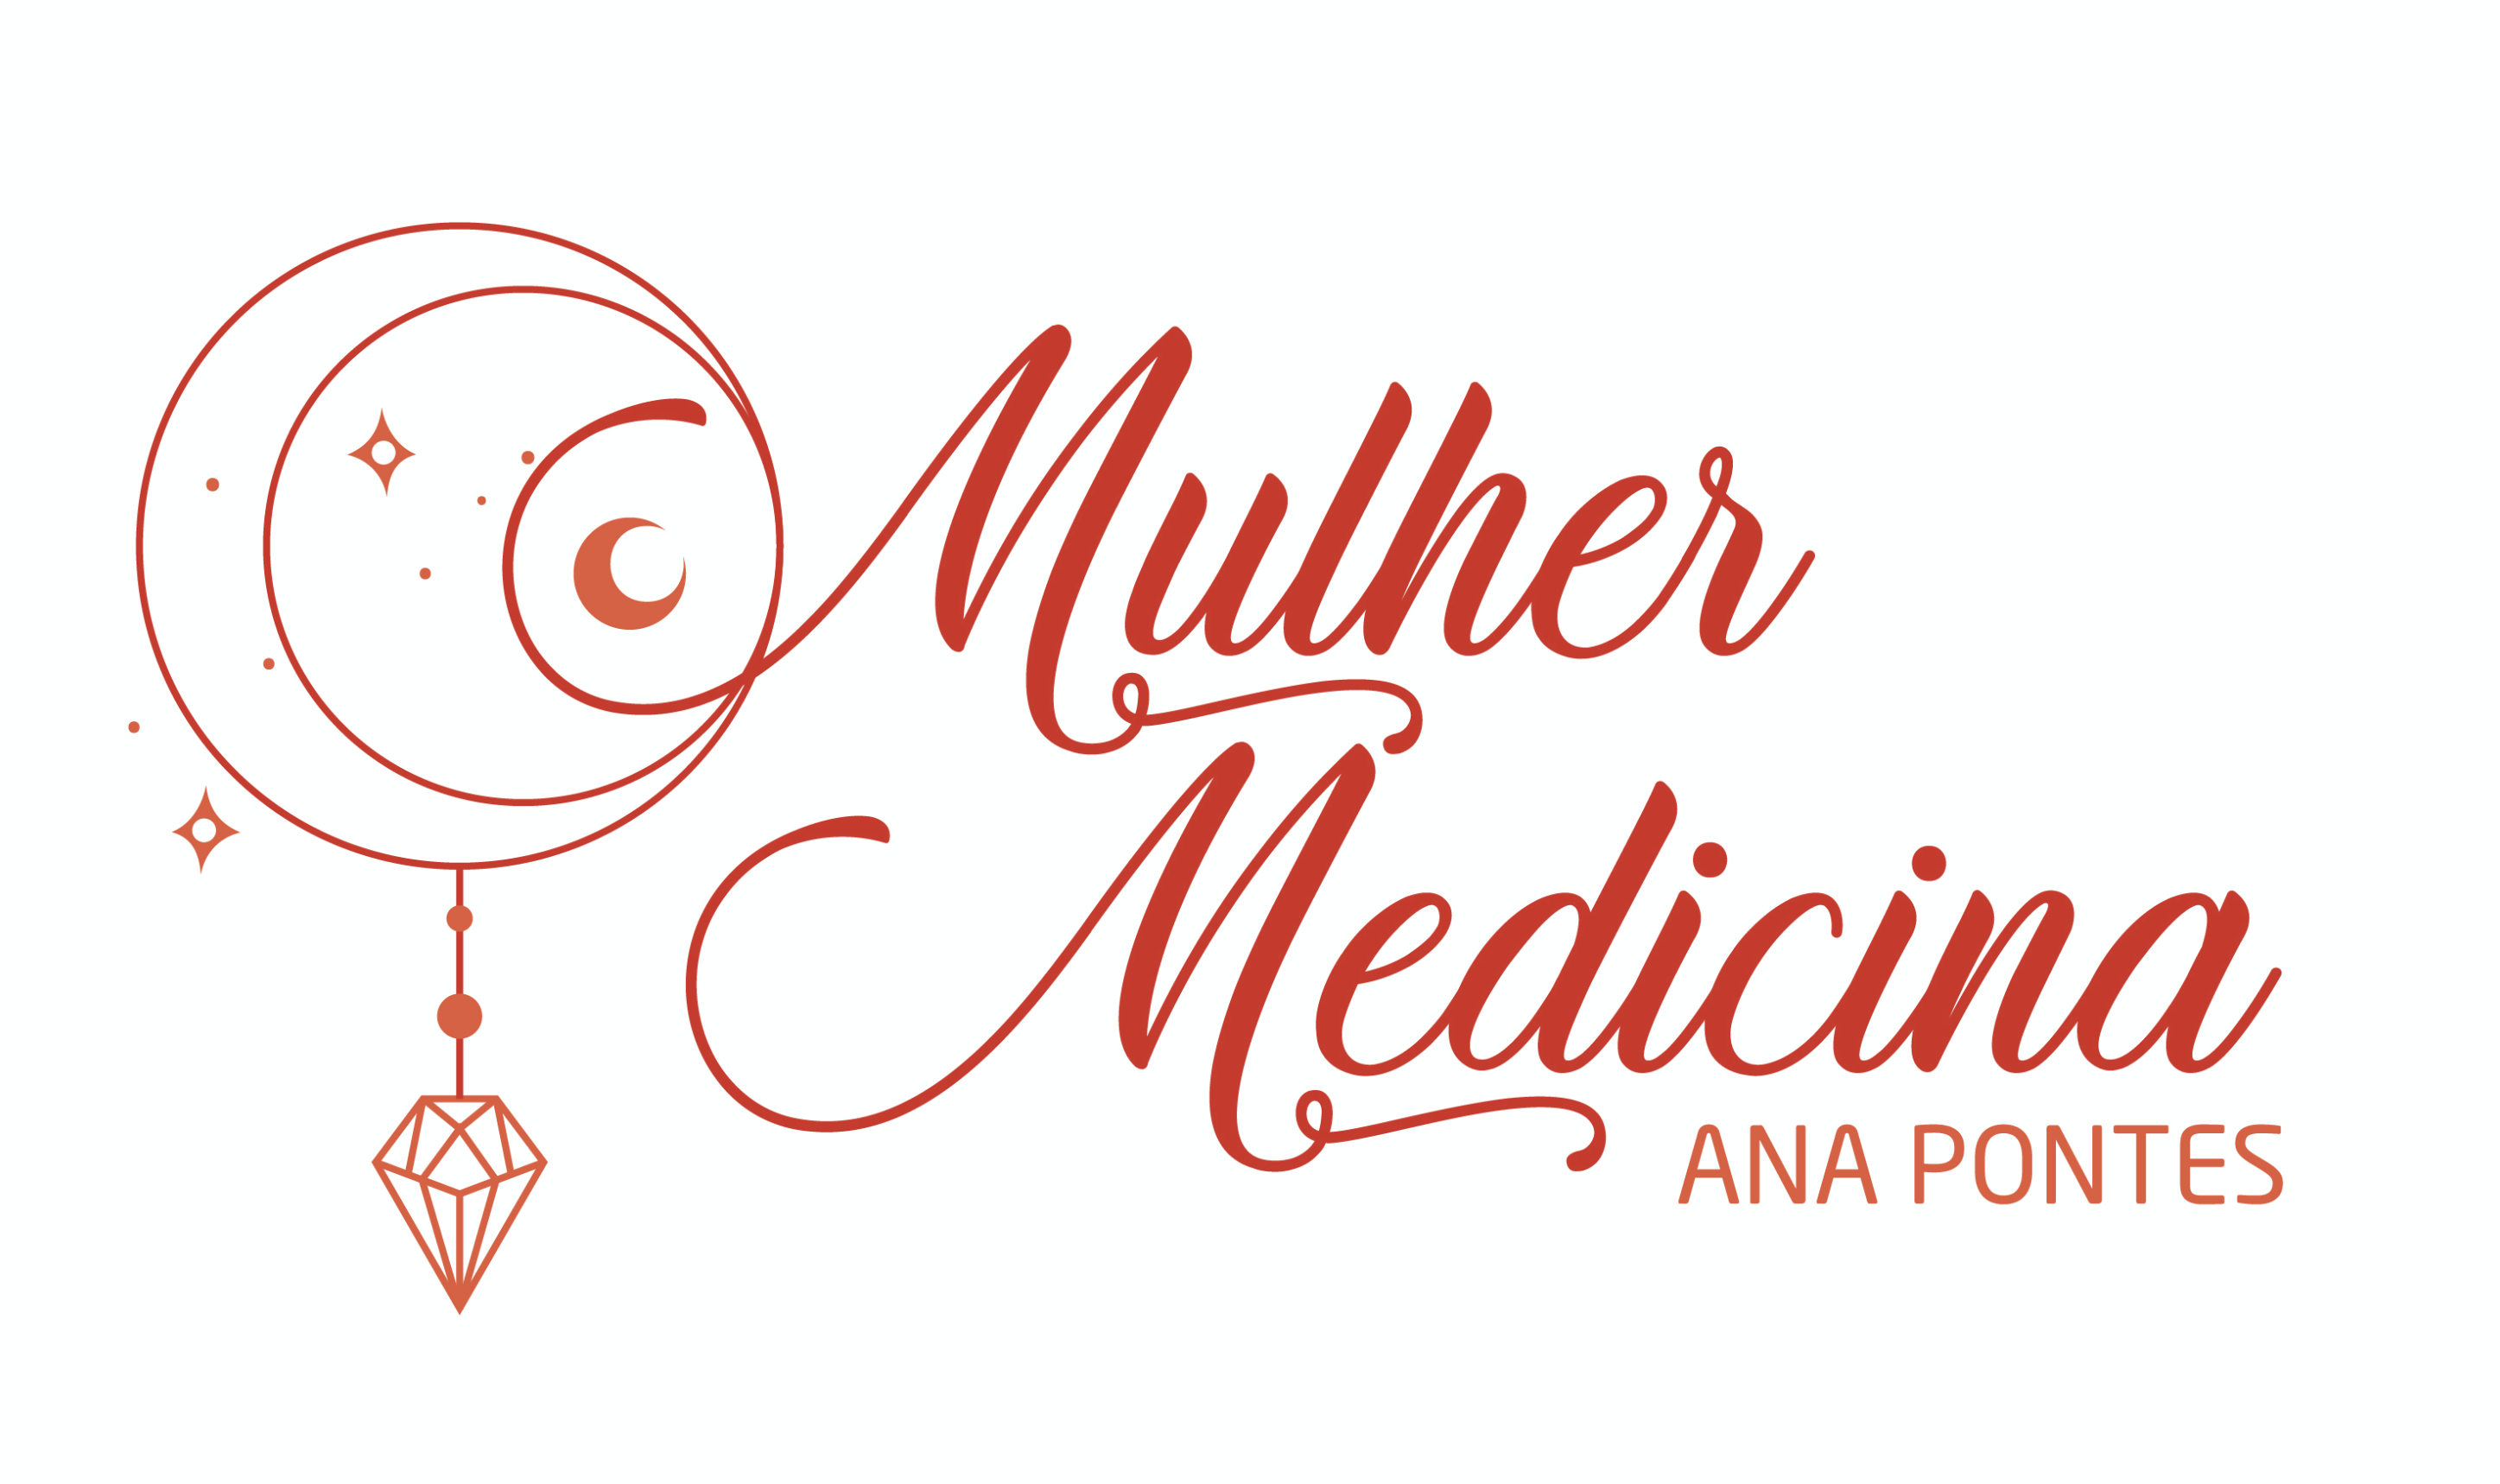 Ana Pontes